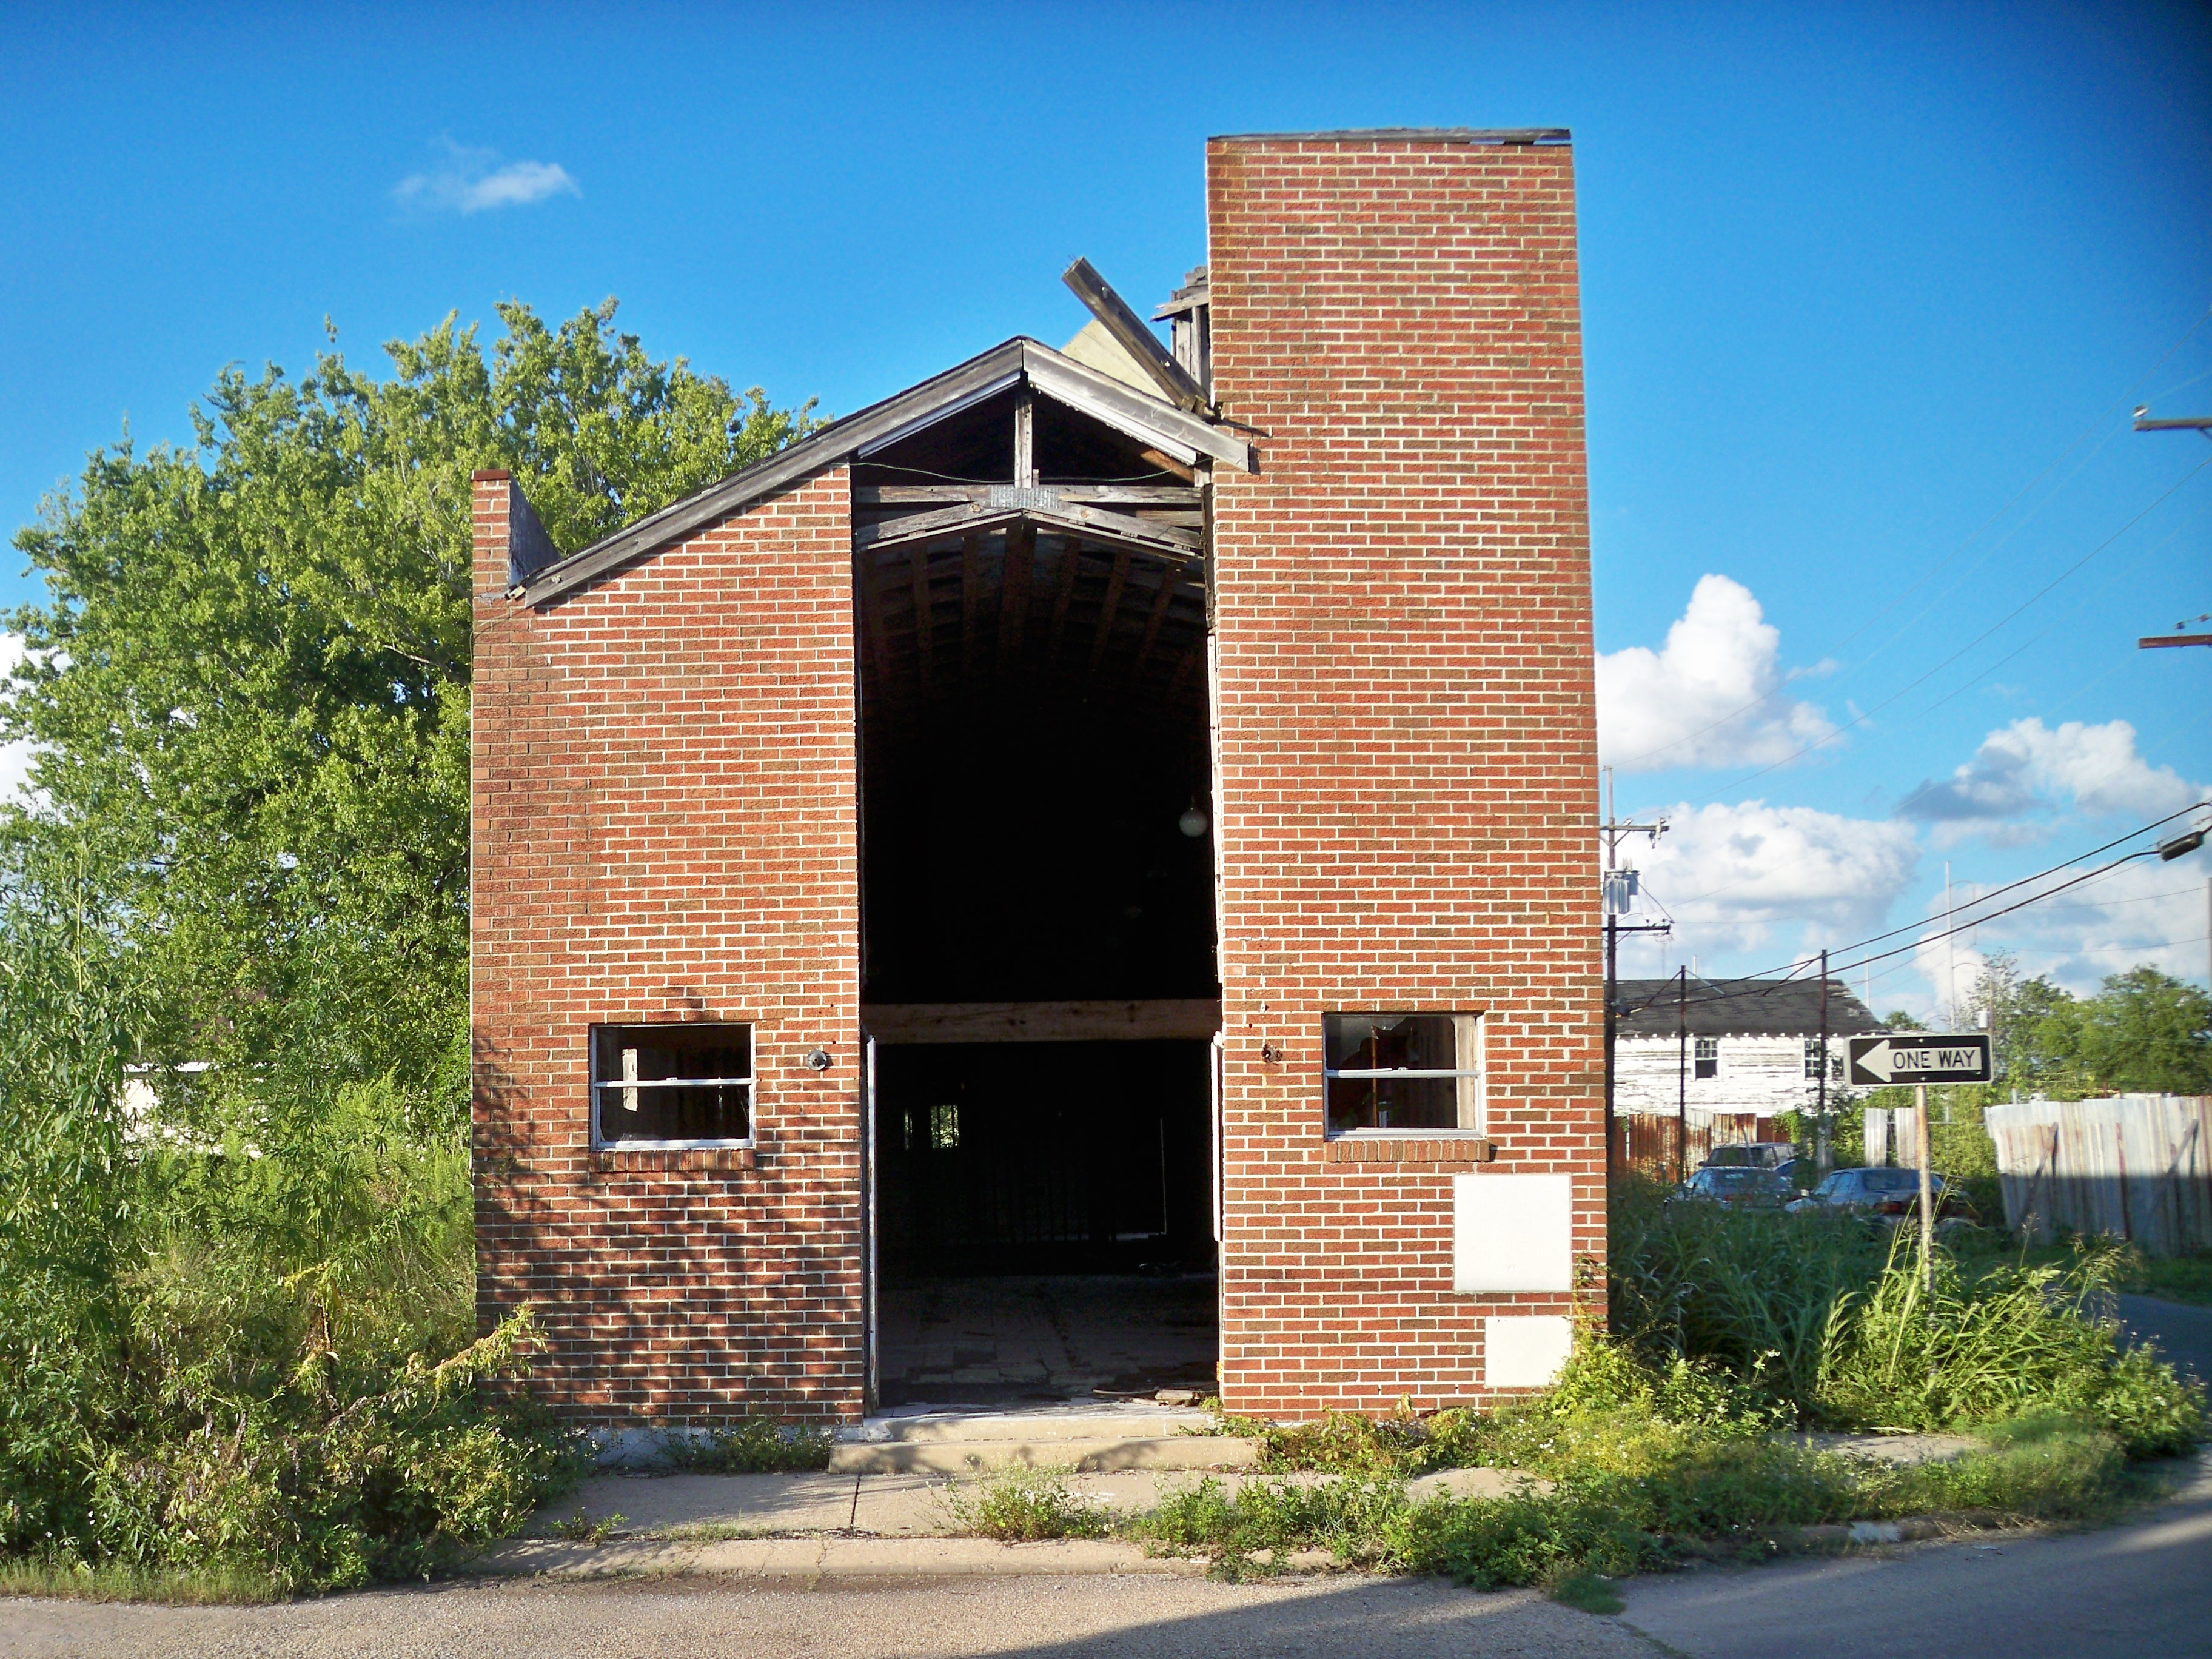 Home Mission Baptist Church on Gayoso